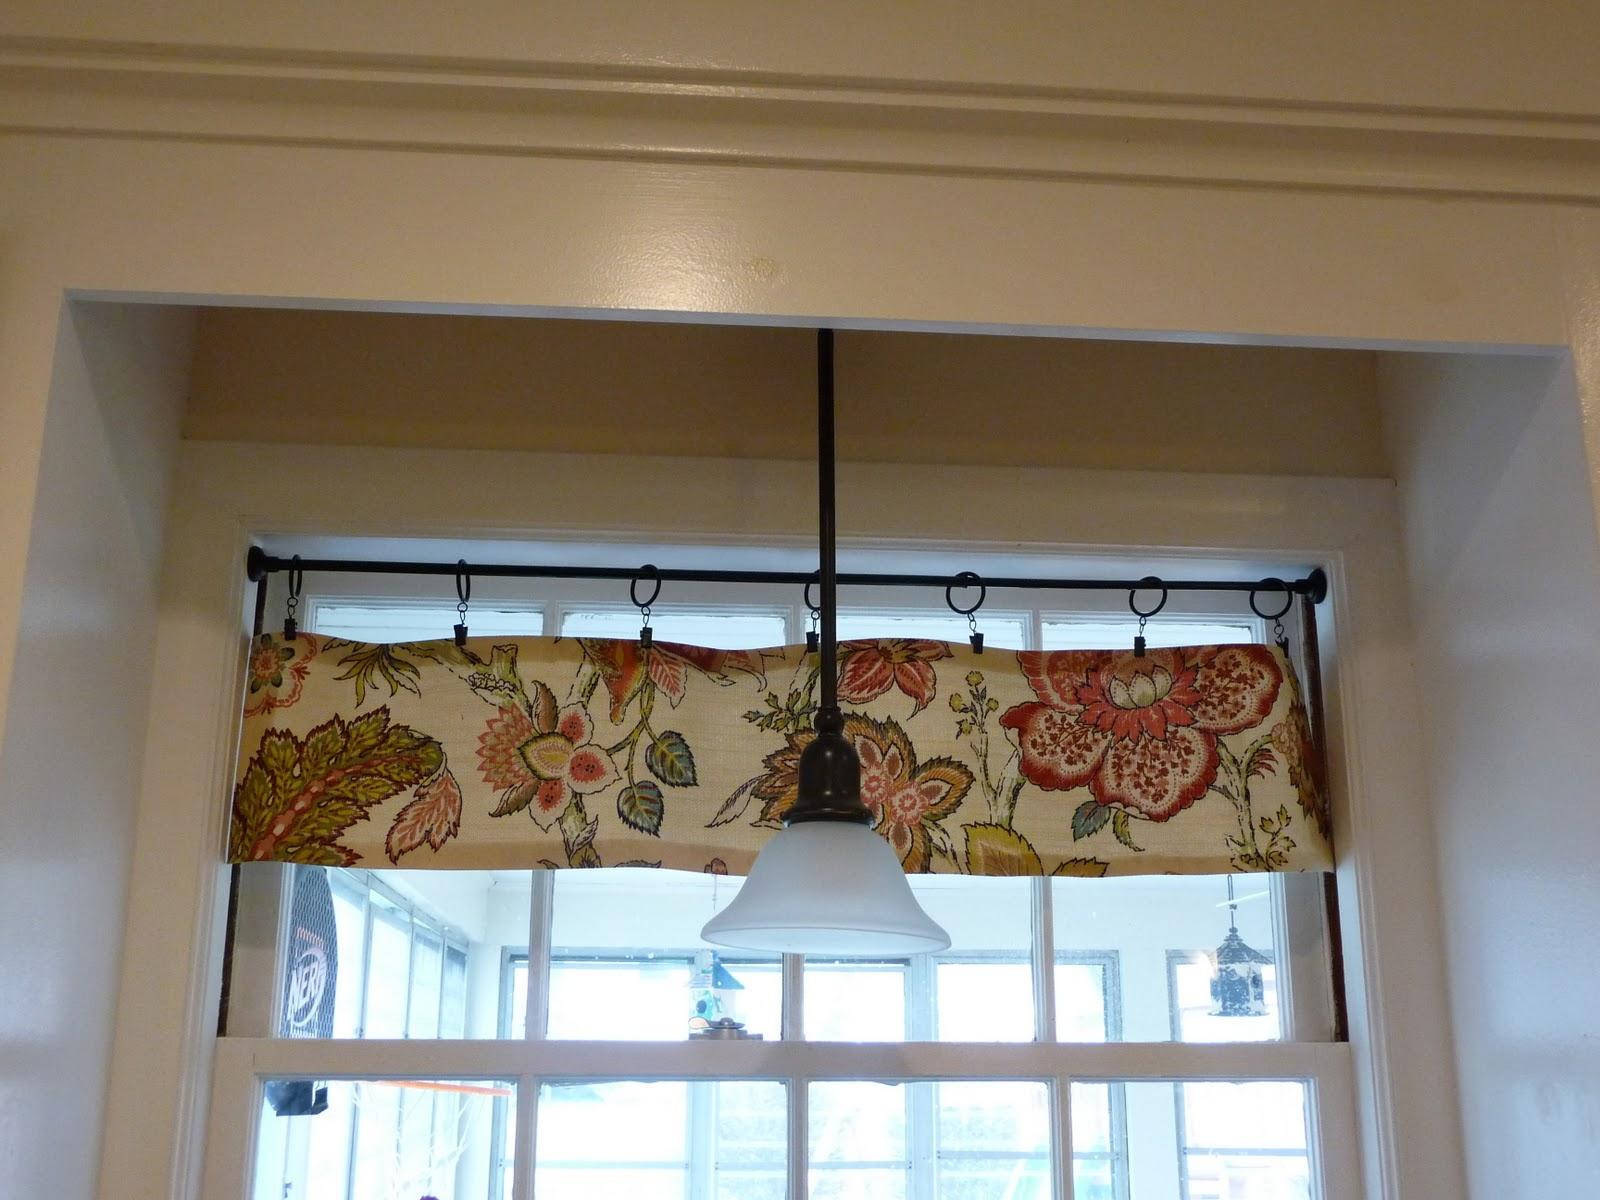 s windownce with home rod valance curtain stupendous inspect ikea black hugad curtains